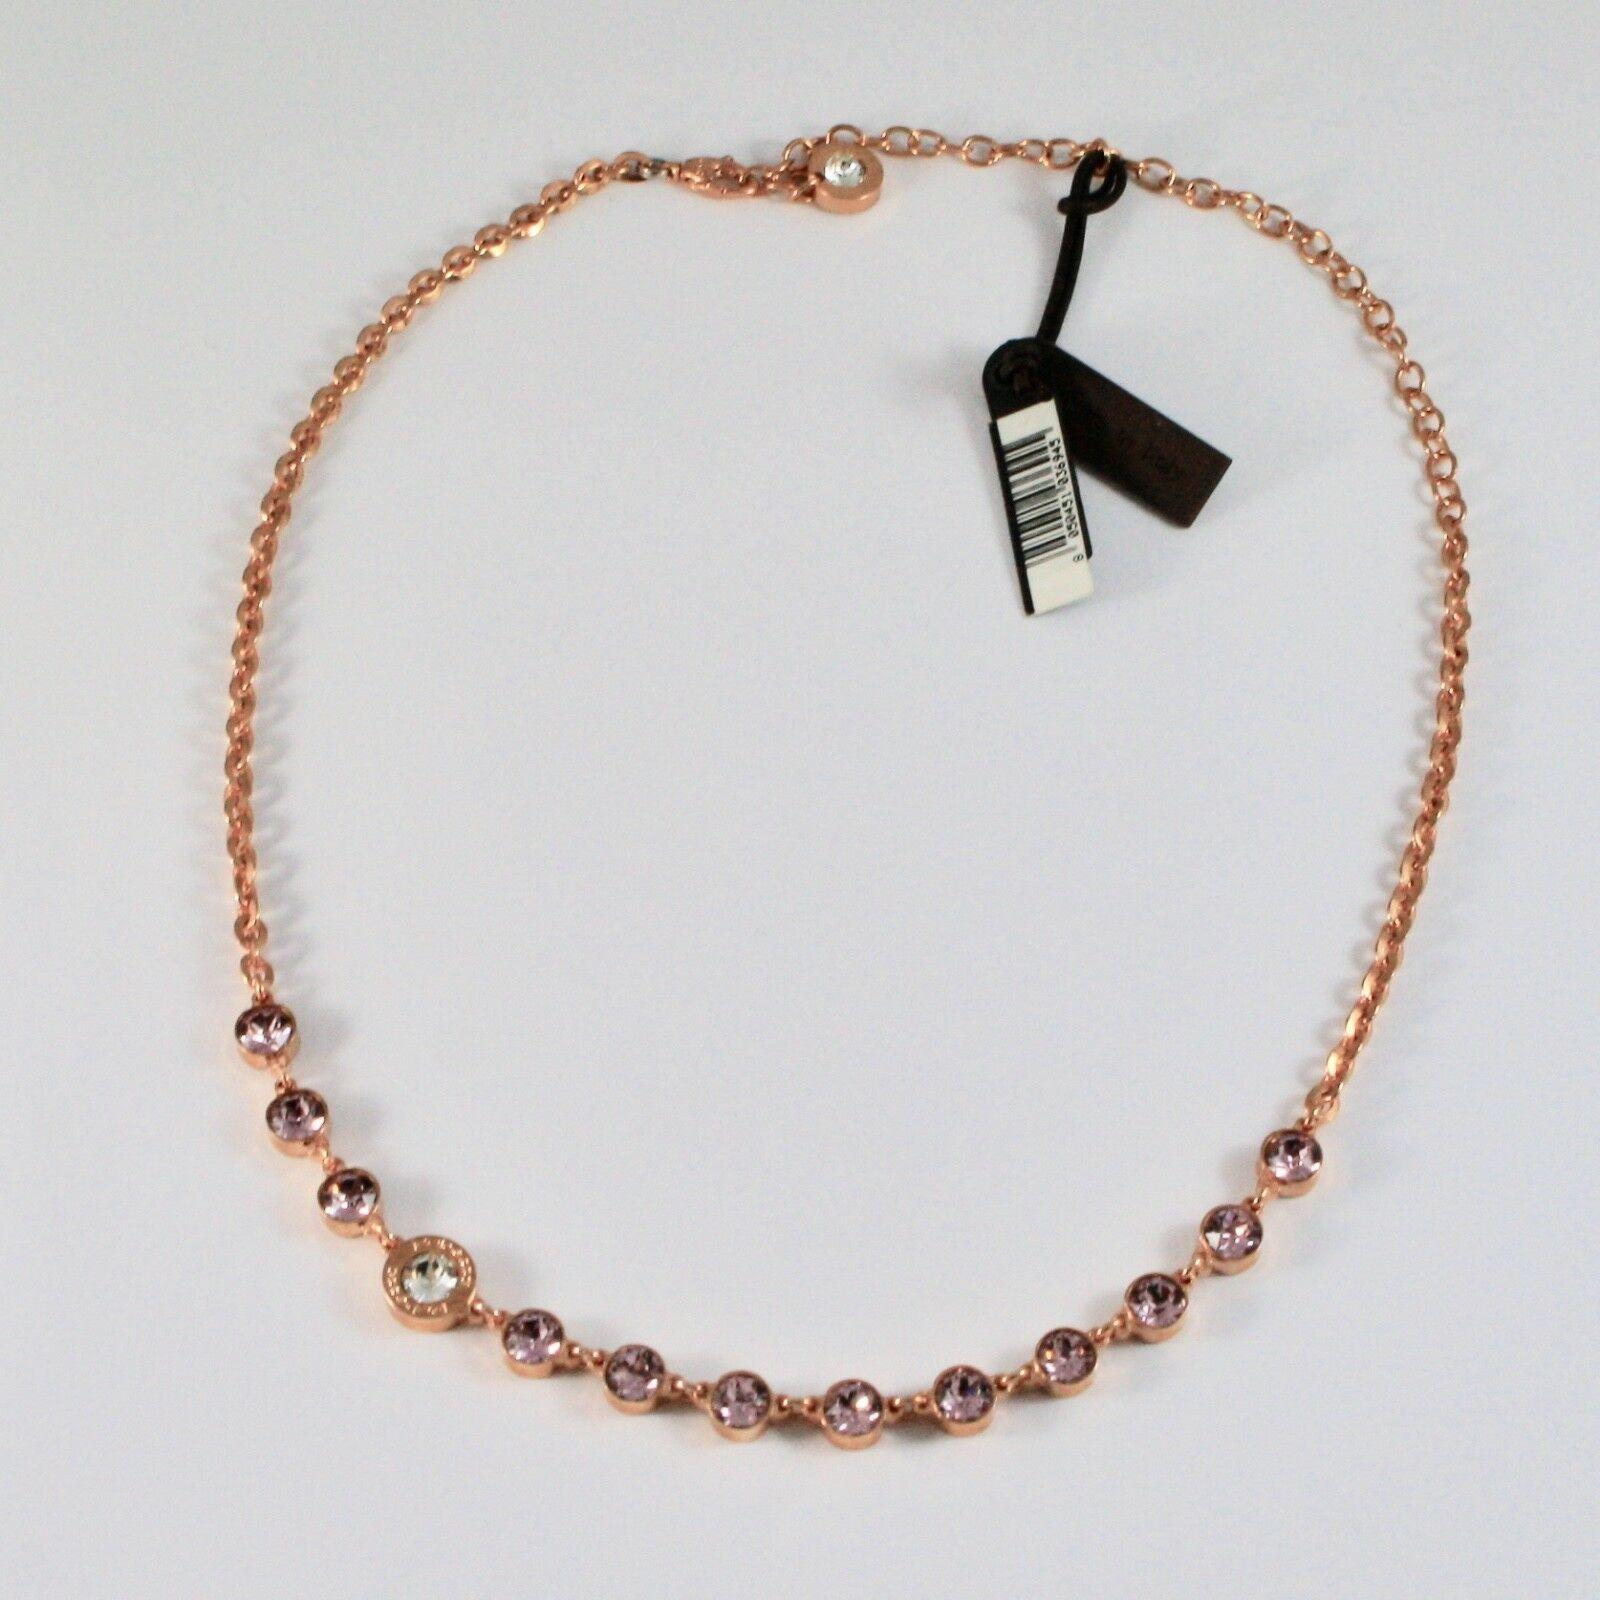 Necklace Rebecca Bronze with Crystals Pink Brilliant Cut BPBKRA54